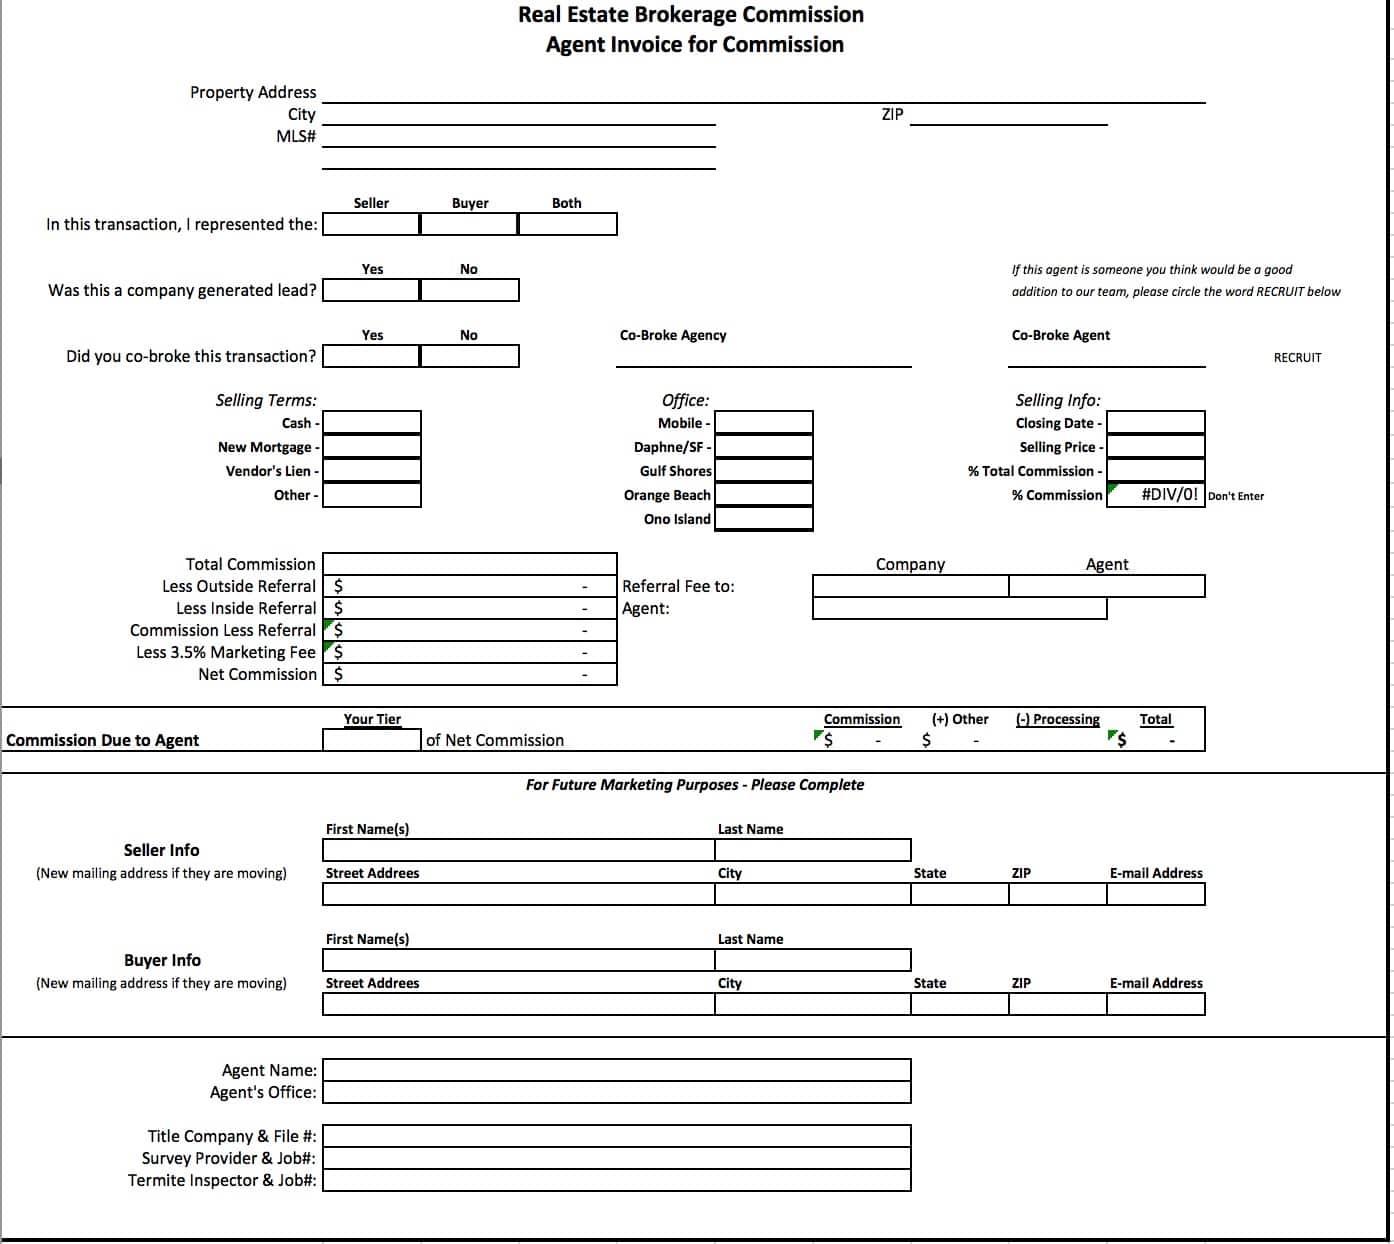 Commission Calculator Spreadsheet